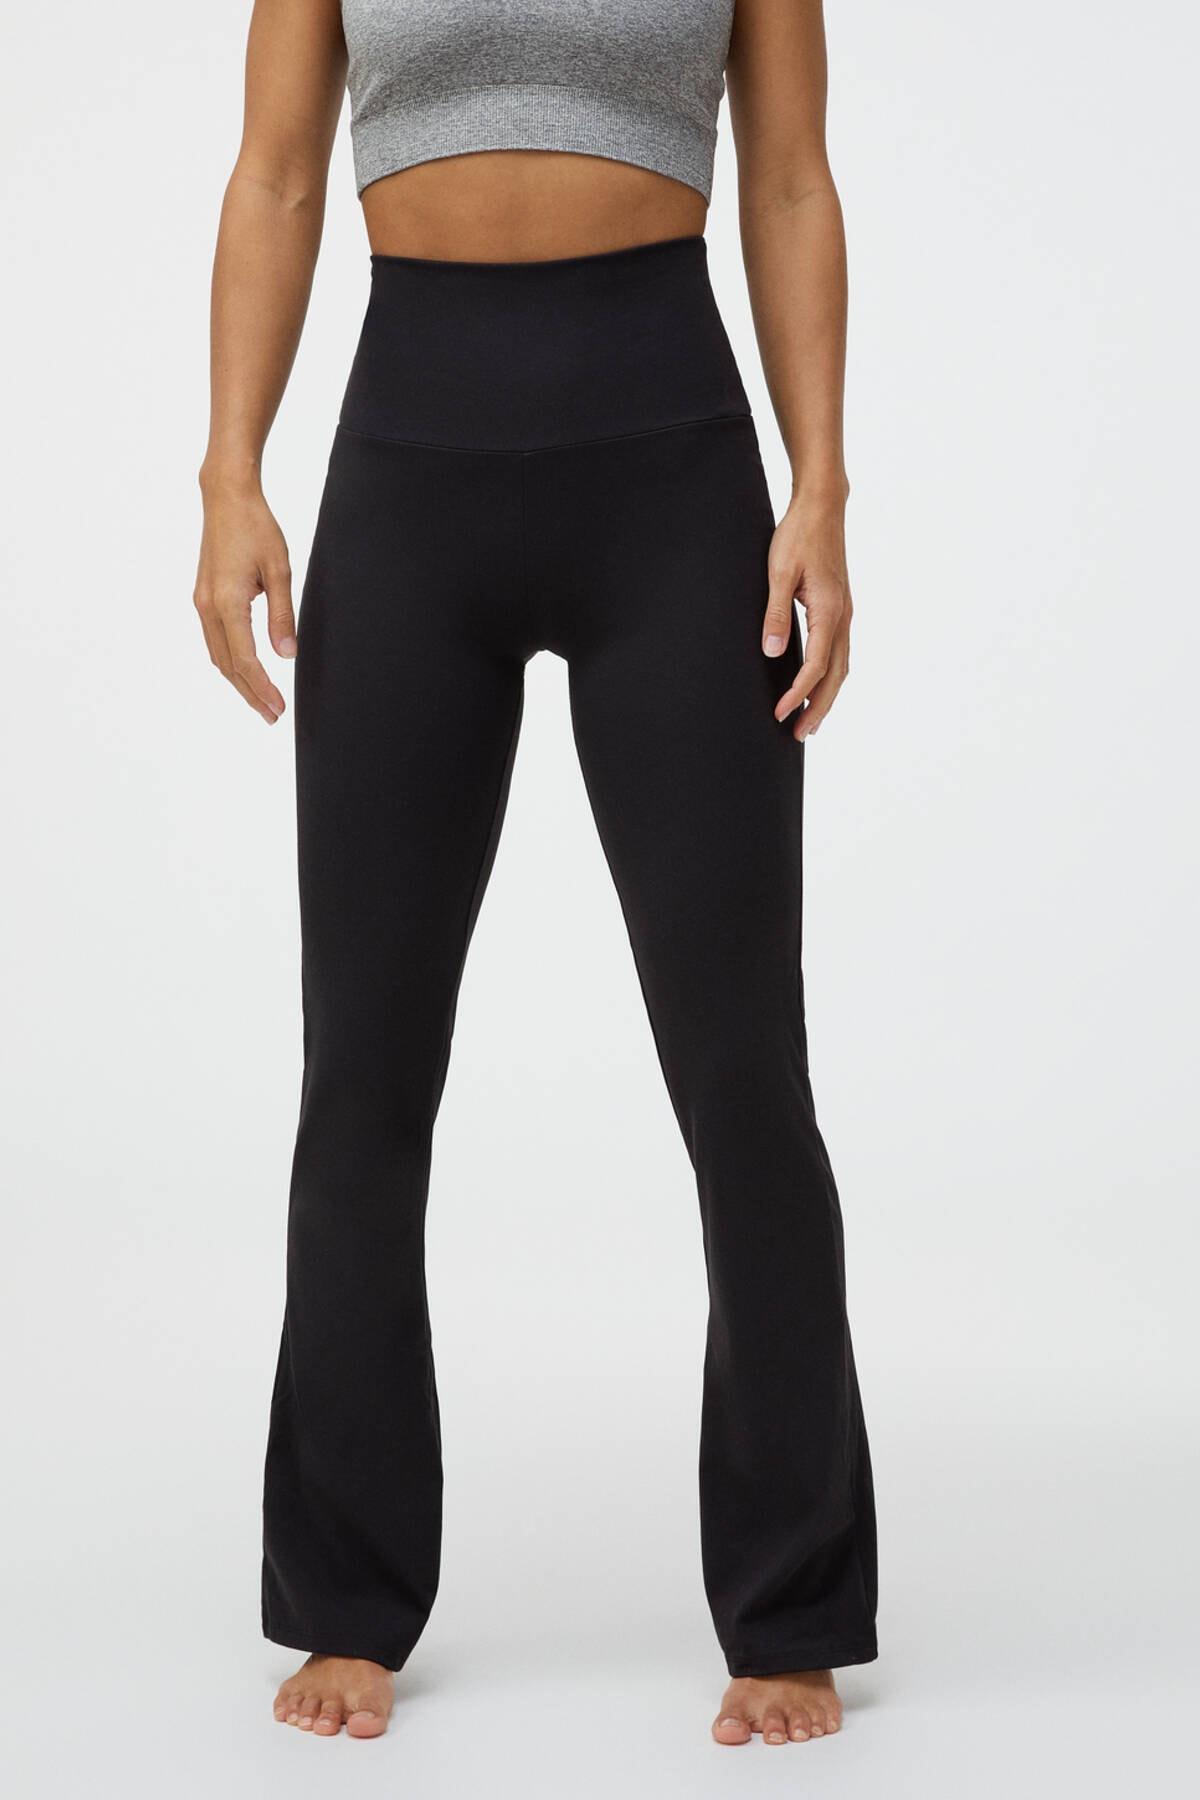 Oysho Kadın Siyah Flare Comfort Pantolon 0